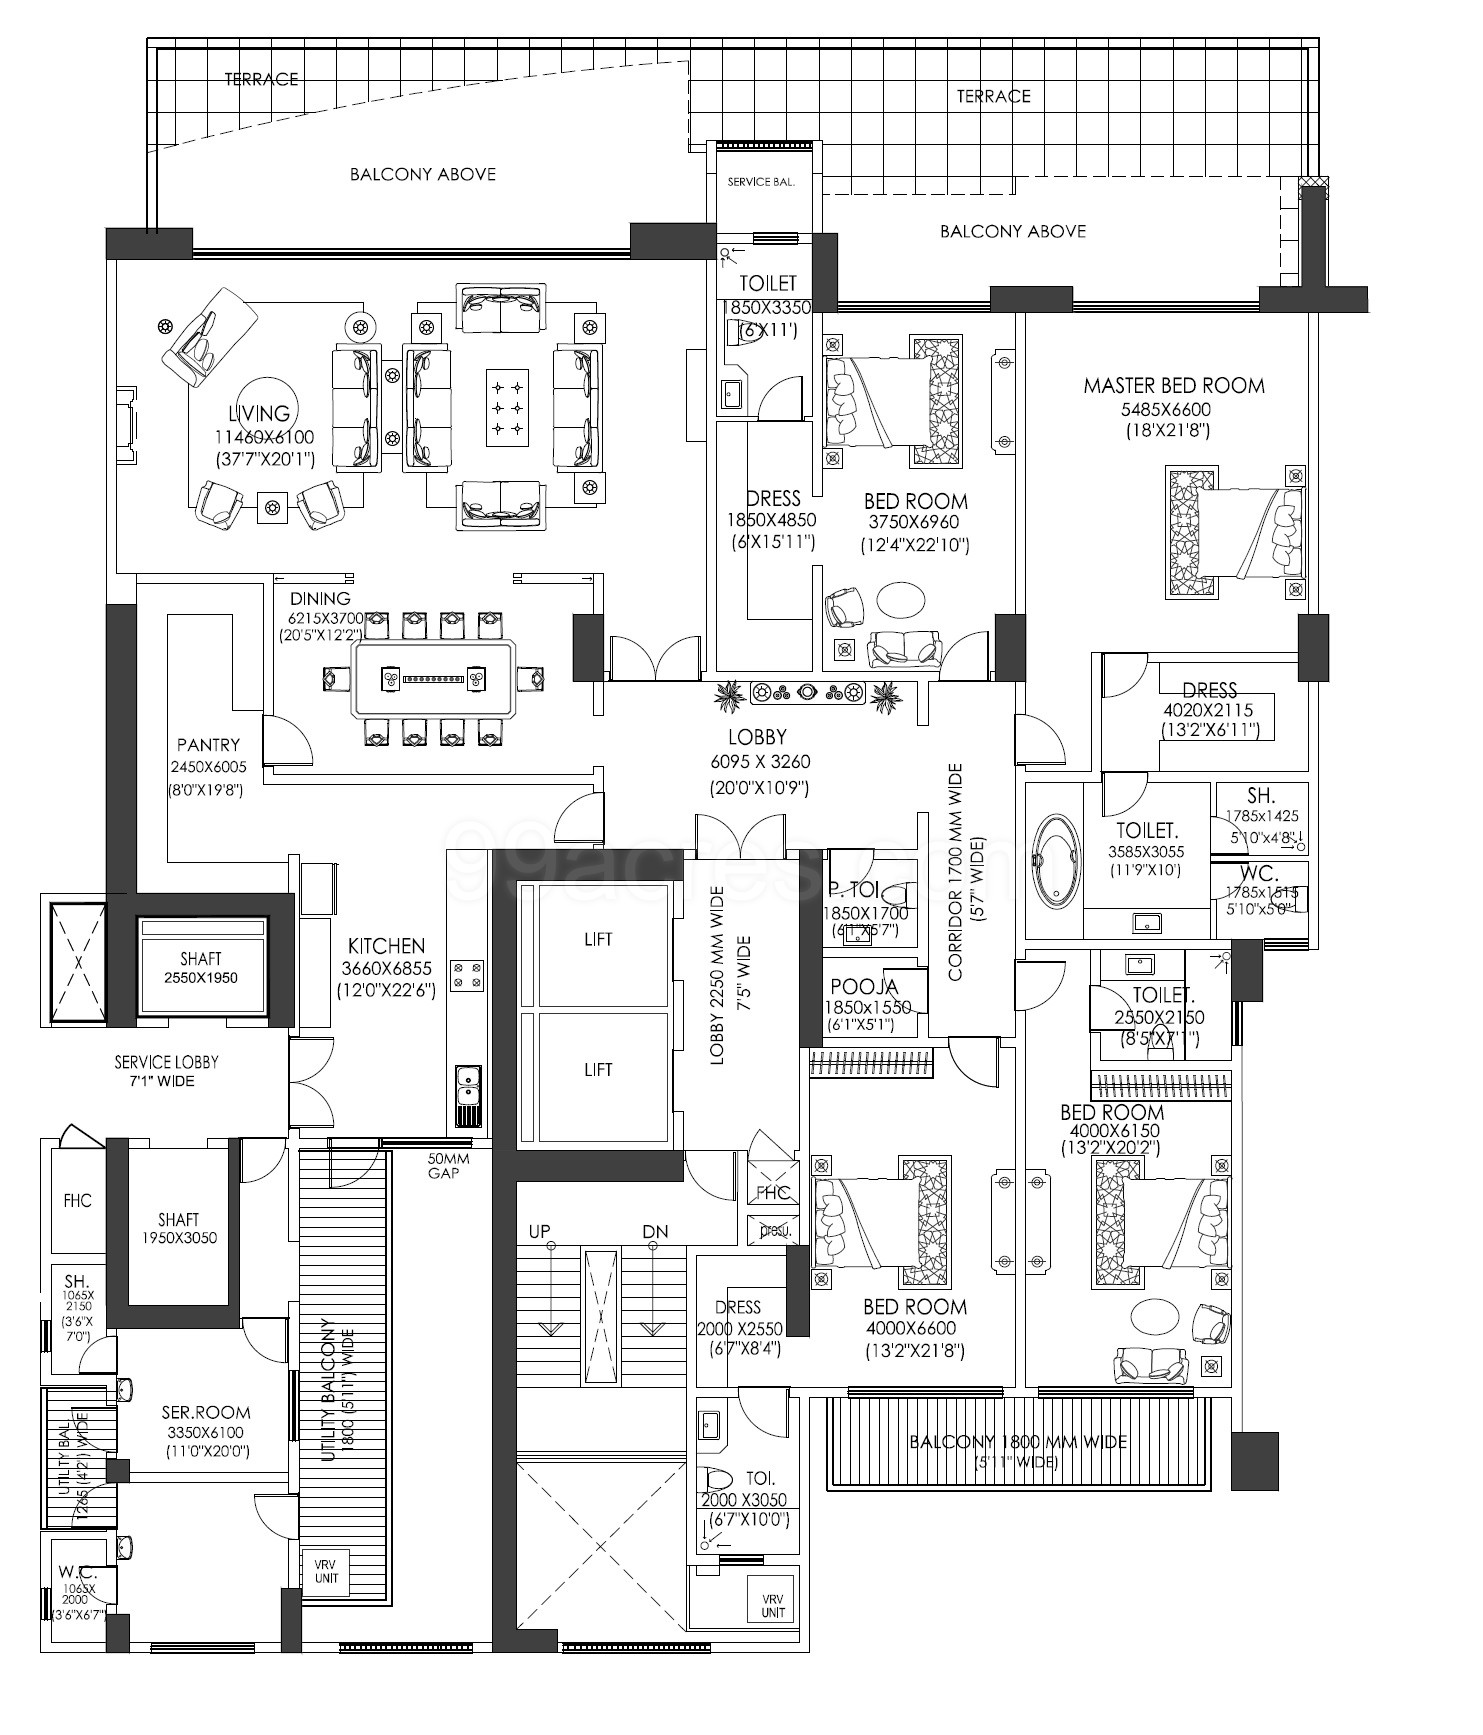 Builders DLF The Camellias Floor Plan